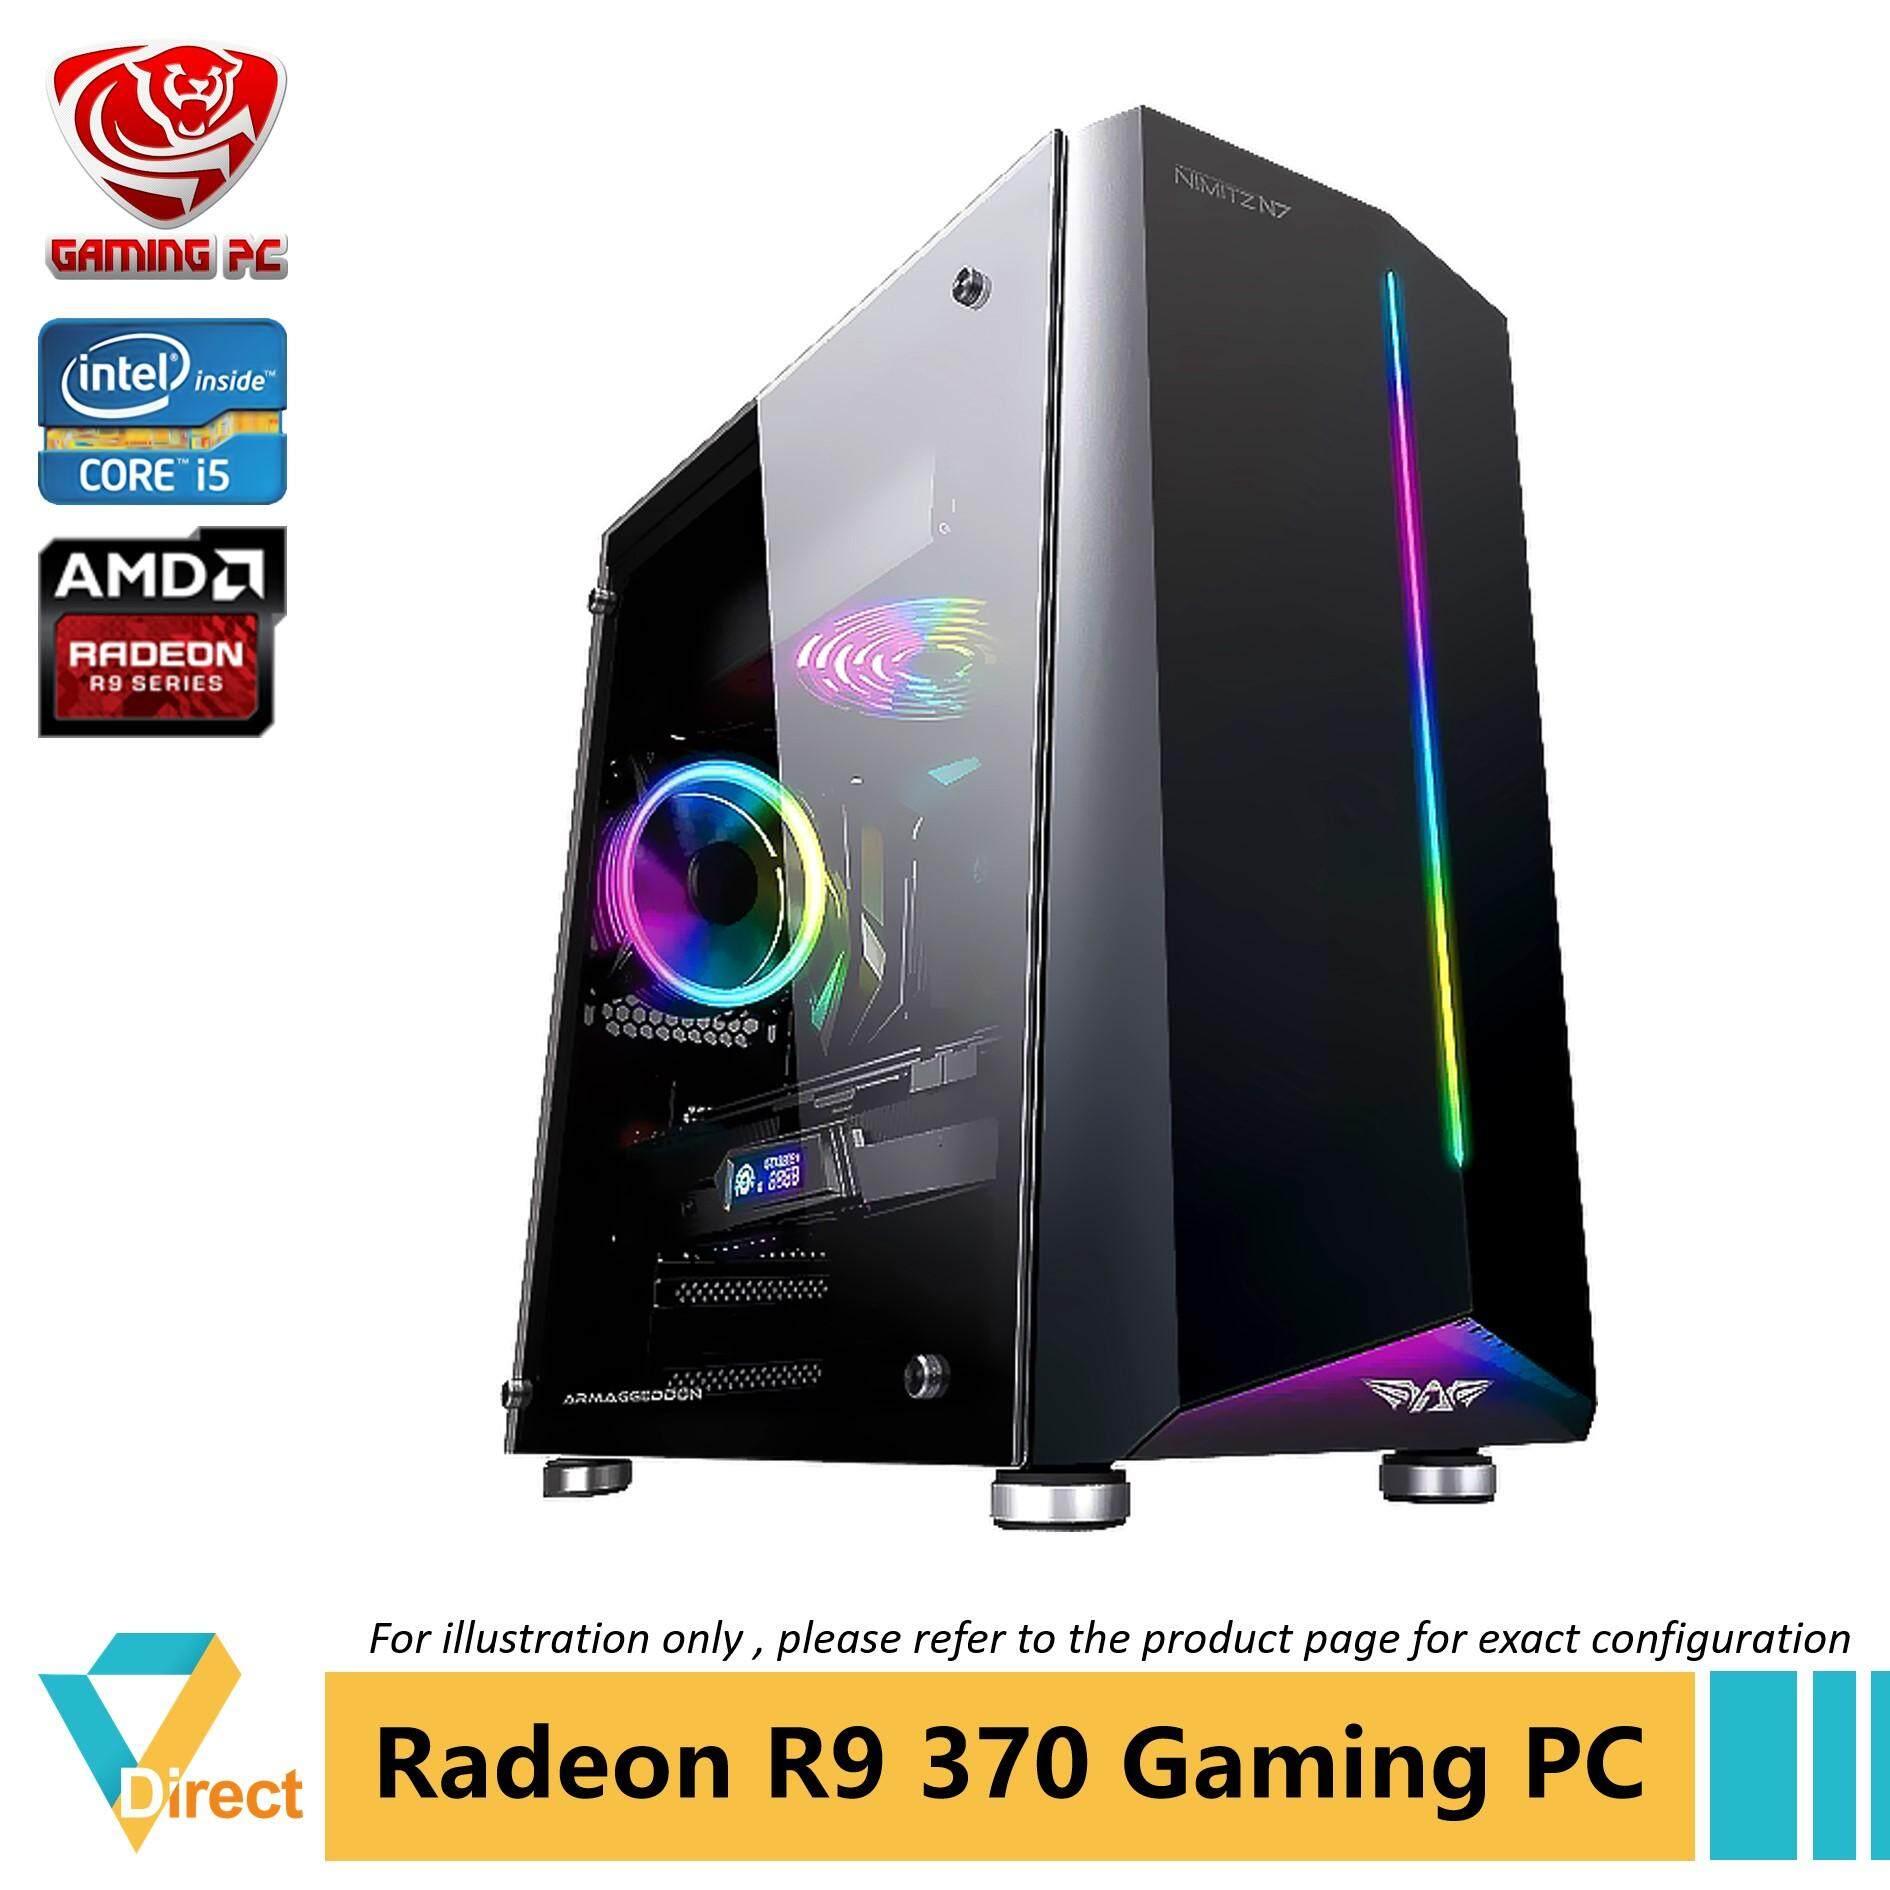 Pubg Radeon Settings